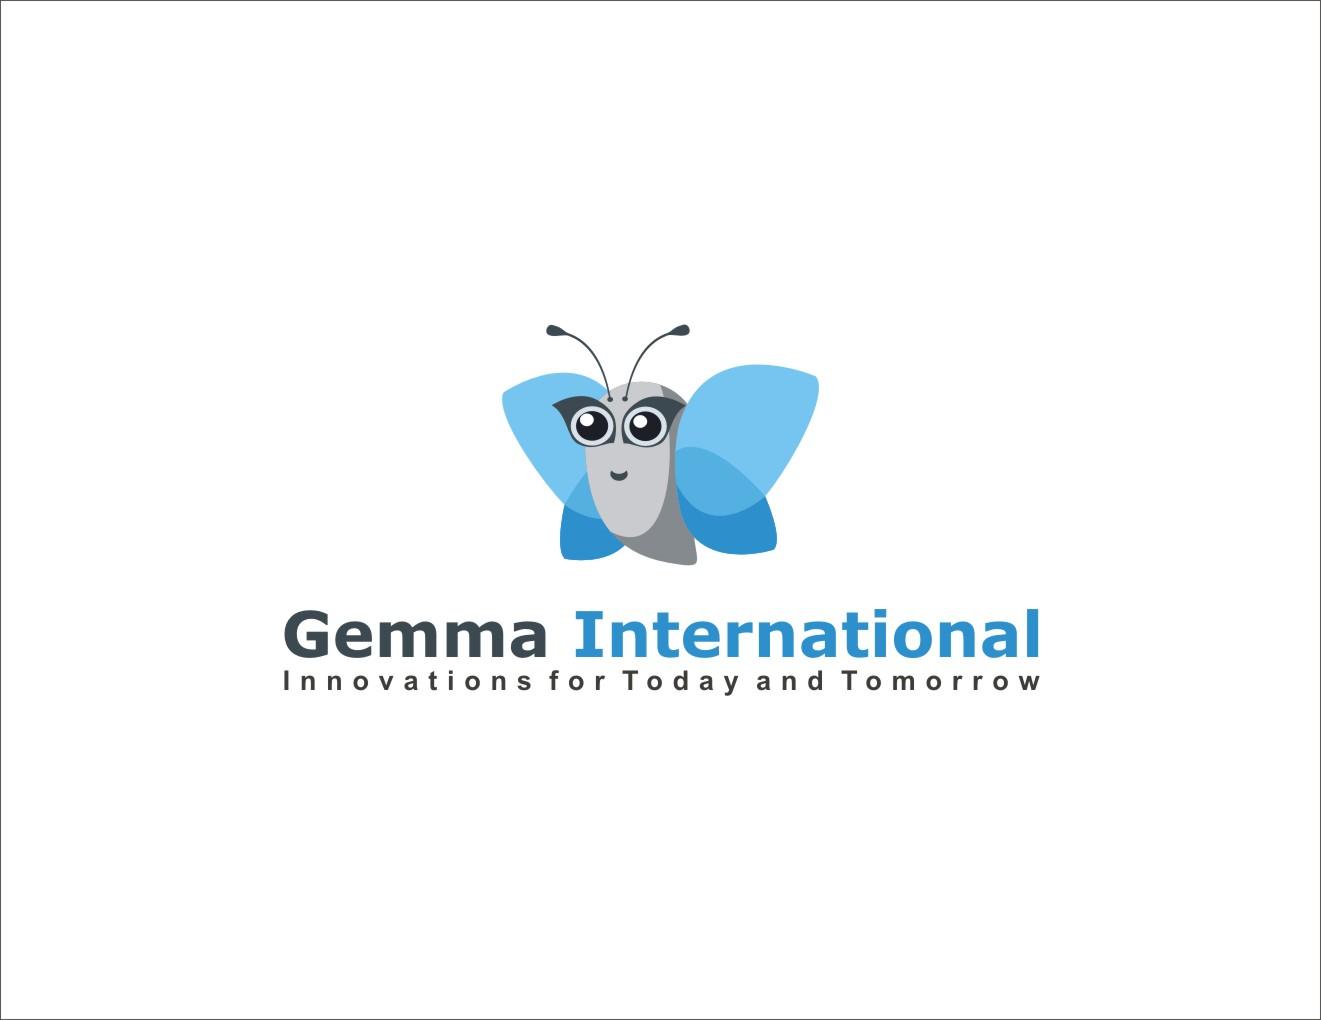 Logo Design by Private User - Entry No. 136 in the Logo Design Contest Artistic Logo Design for Gemma International.